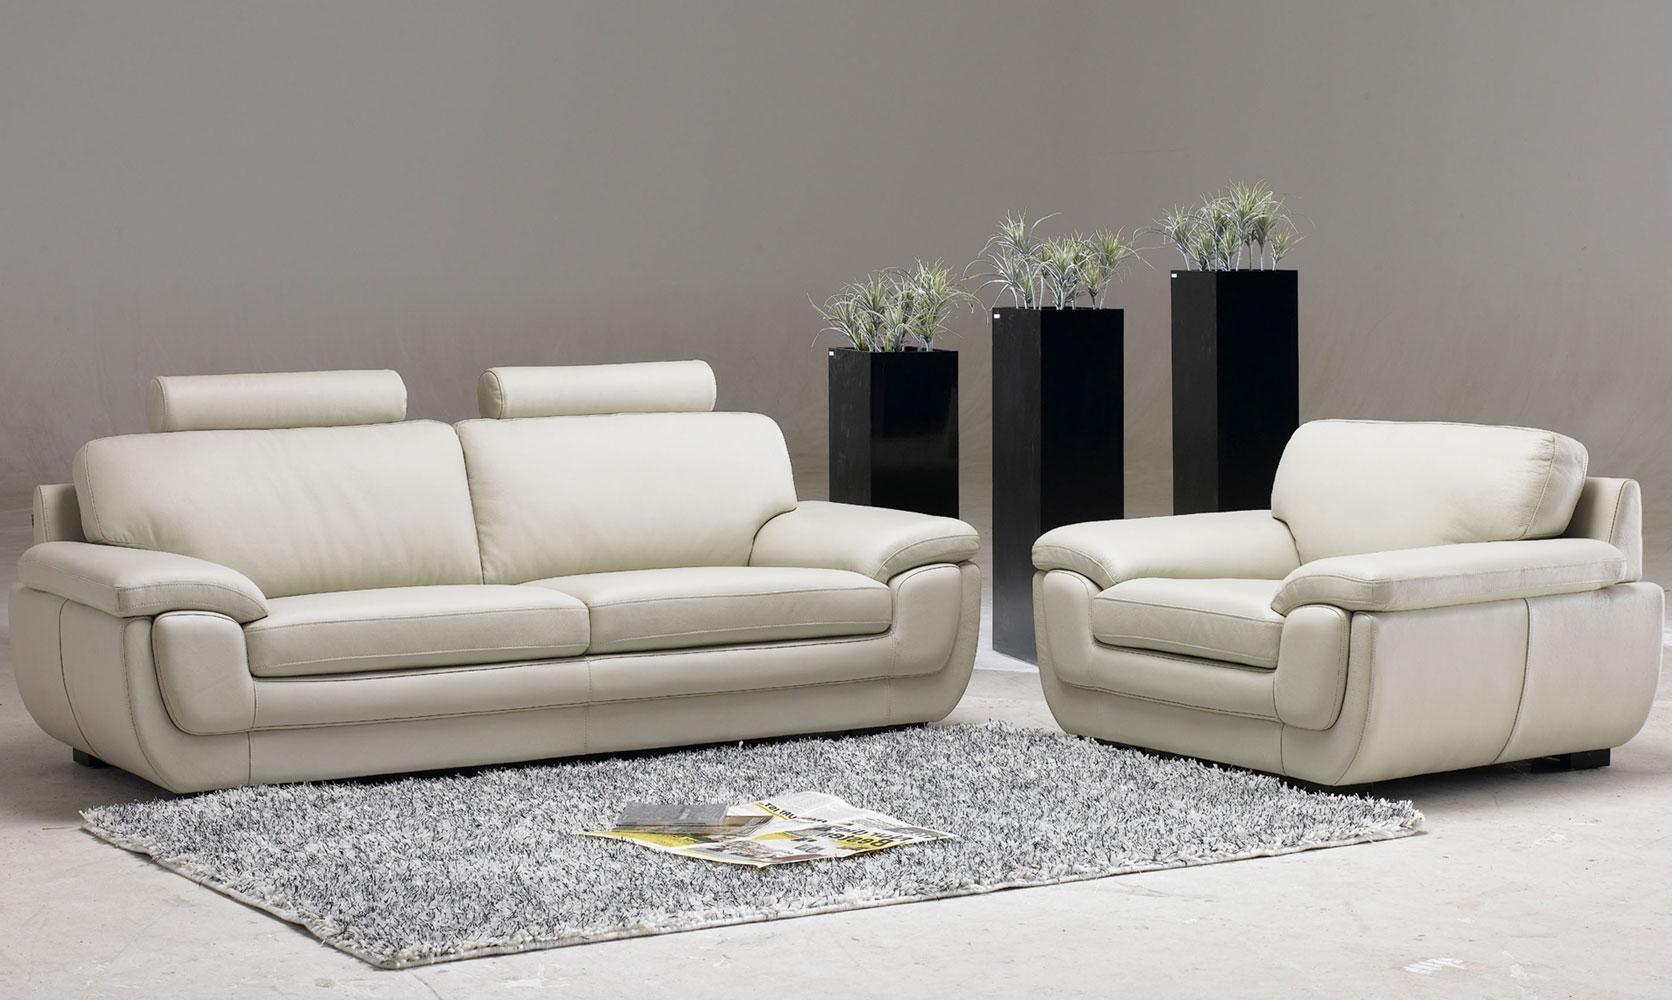 Living Room Sofa Living Room Design And Living Room Ideas With Sofa Chairs For Living Room (Image 12 of 20)